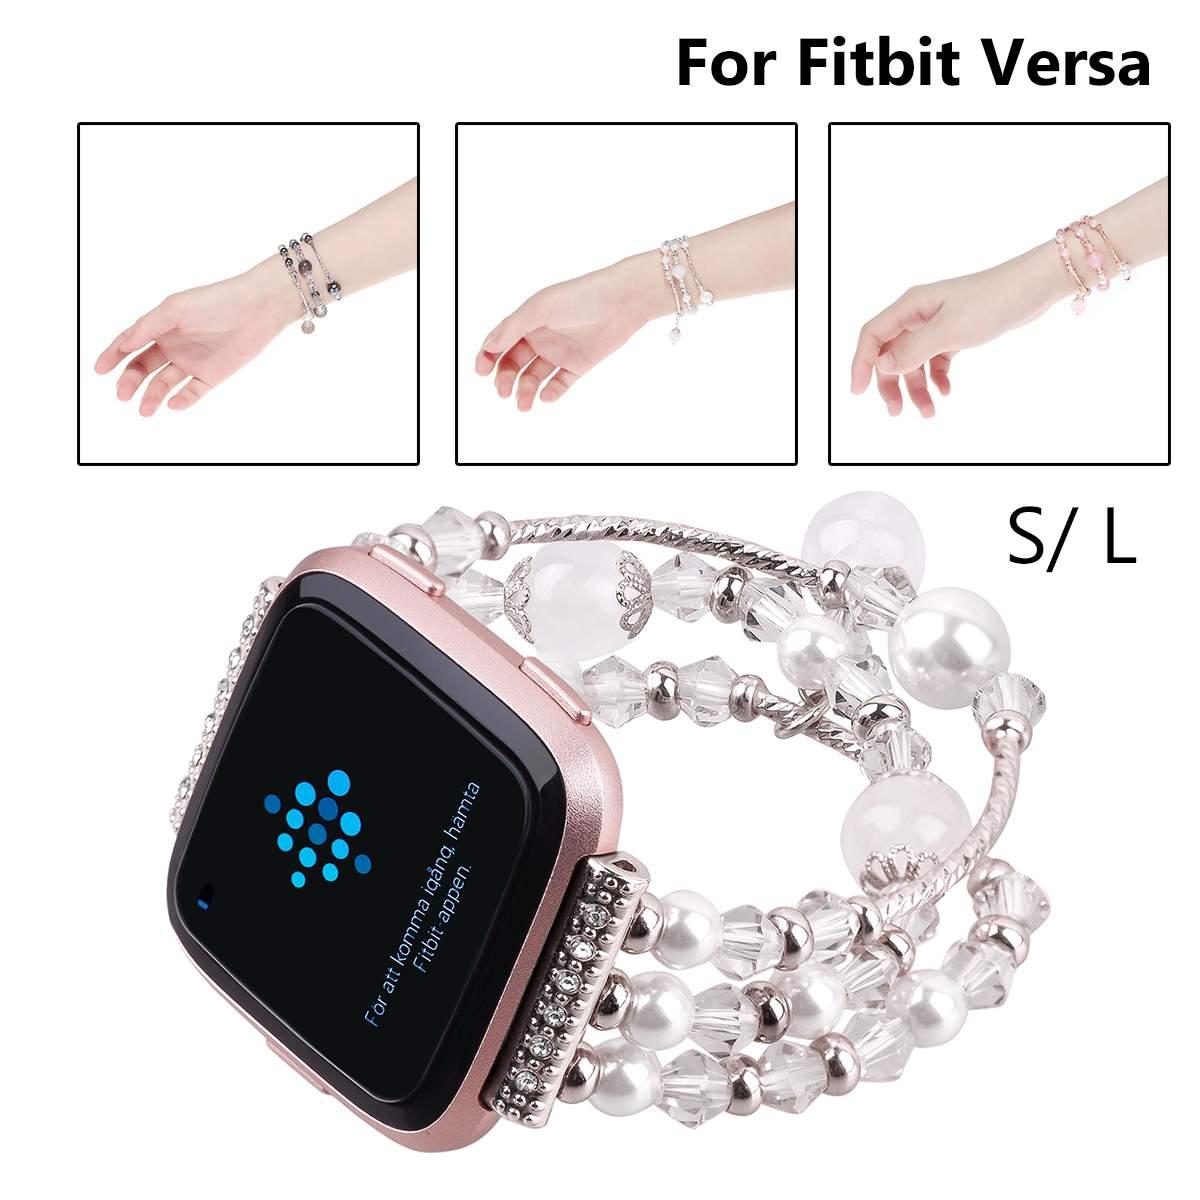 S/L NewFashion Beaded Sport Watch Bands Strap Replacement for Fitbit Versa Smart Bracelet Wristband Smart Watchbands Accessories